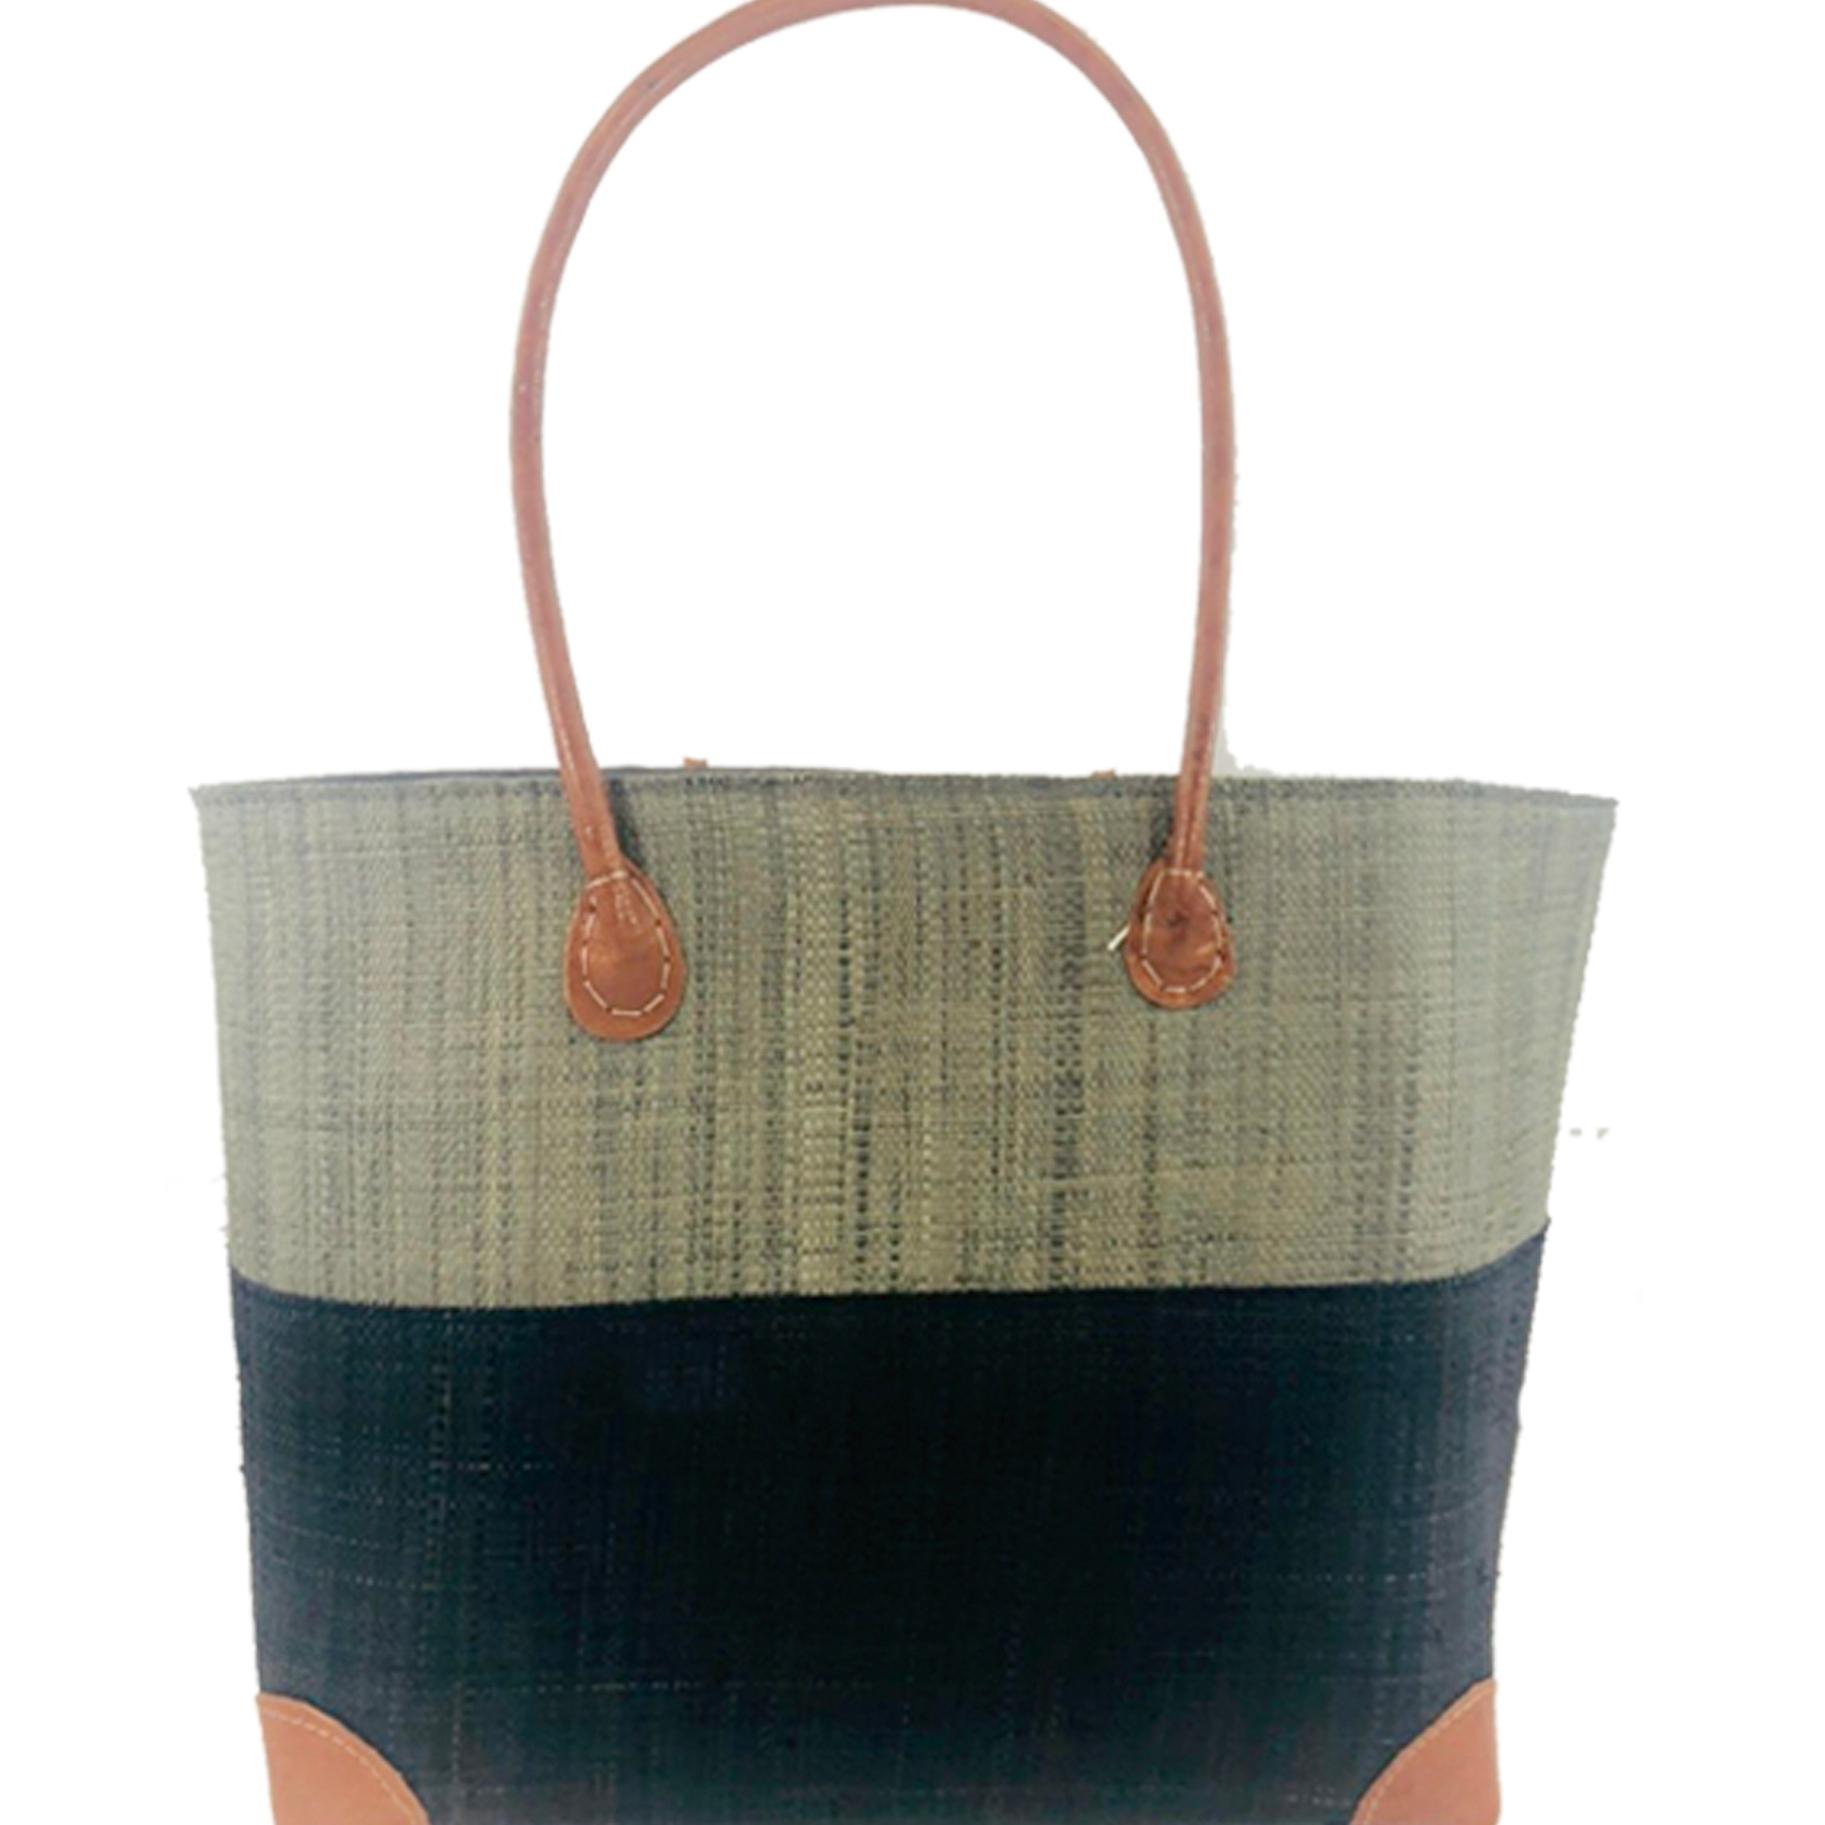 Trinidad Two Tone Straw Basket - Grey and black | Trada Marketplace